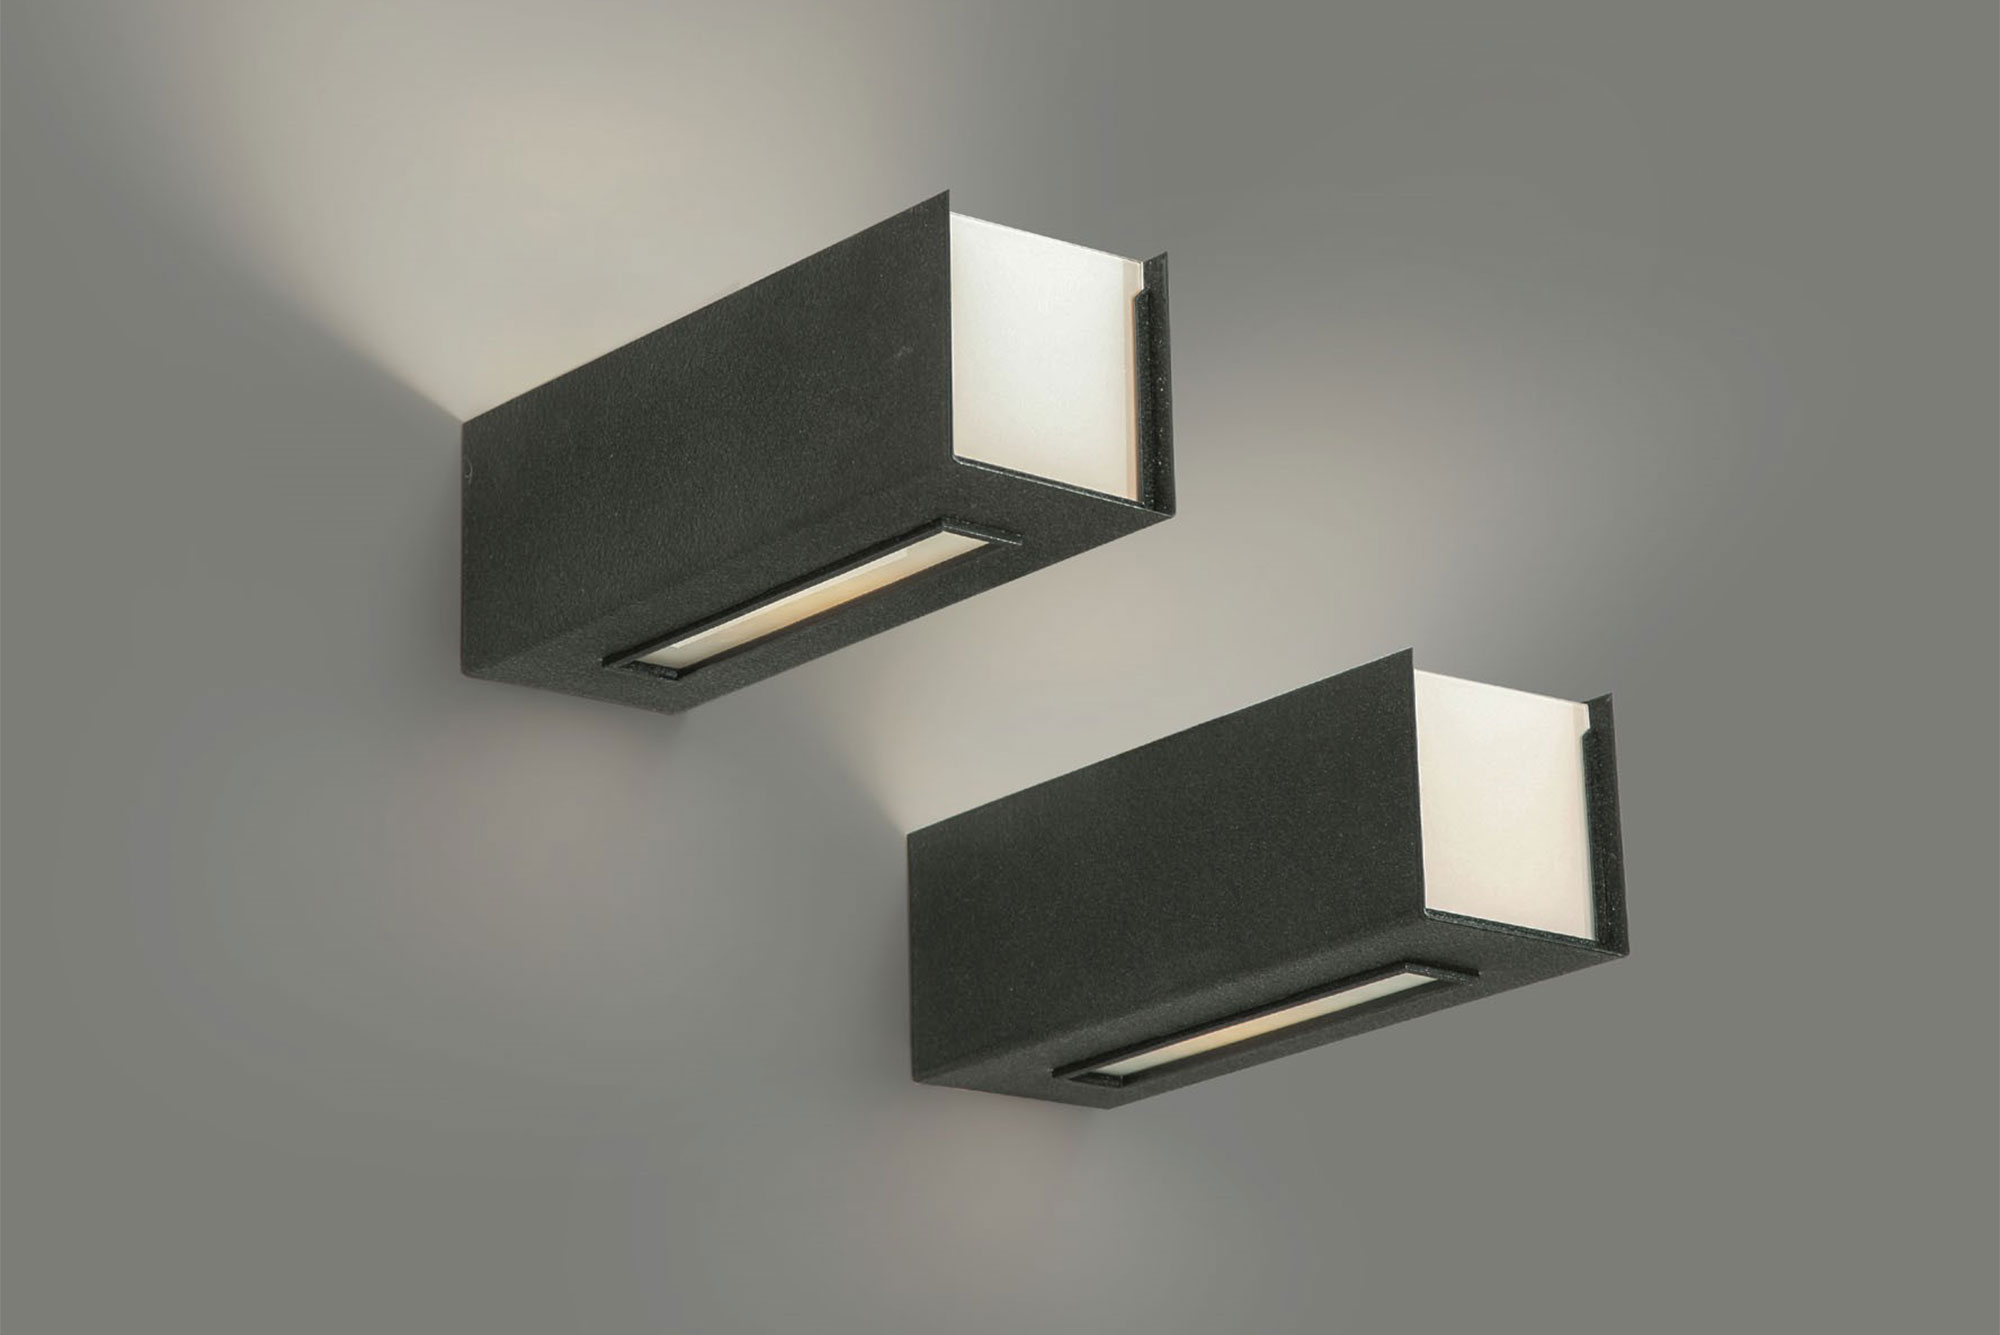 Wall lamps model 249